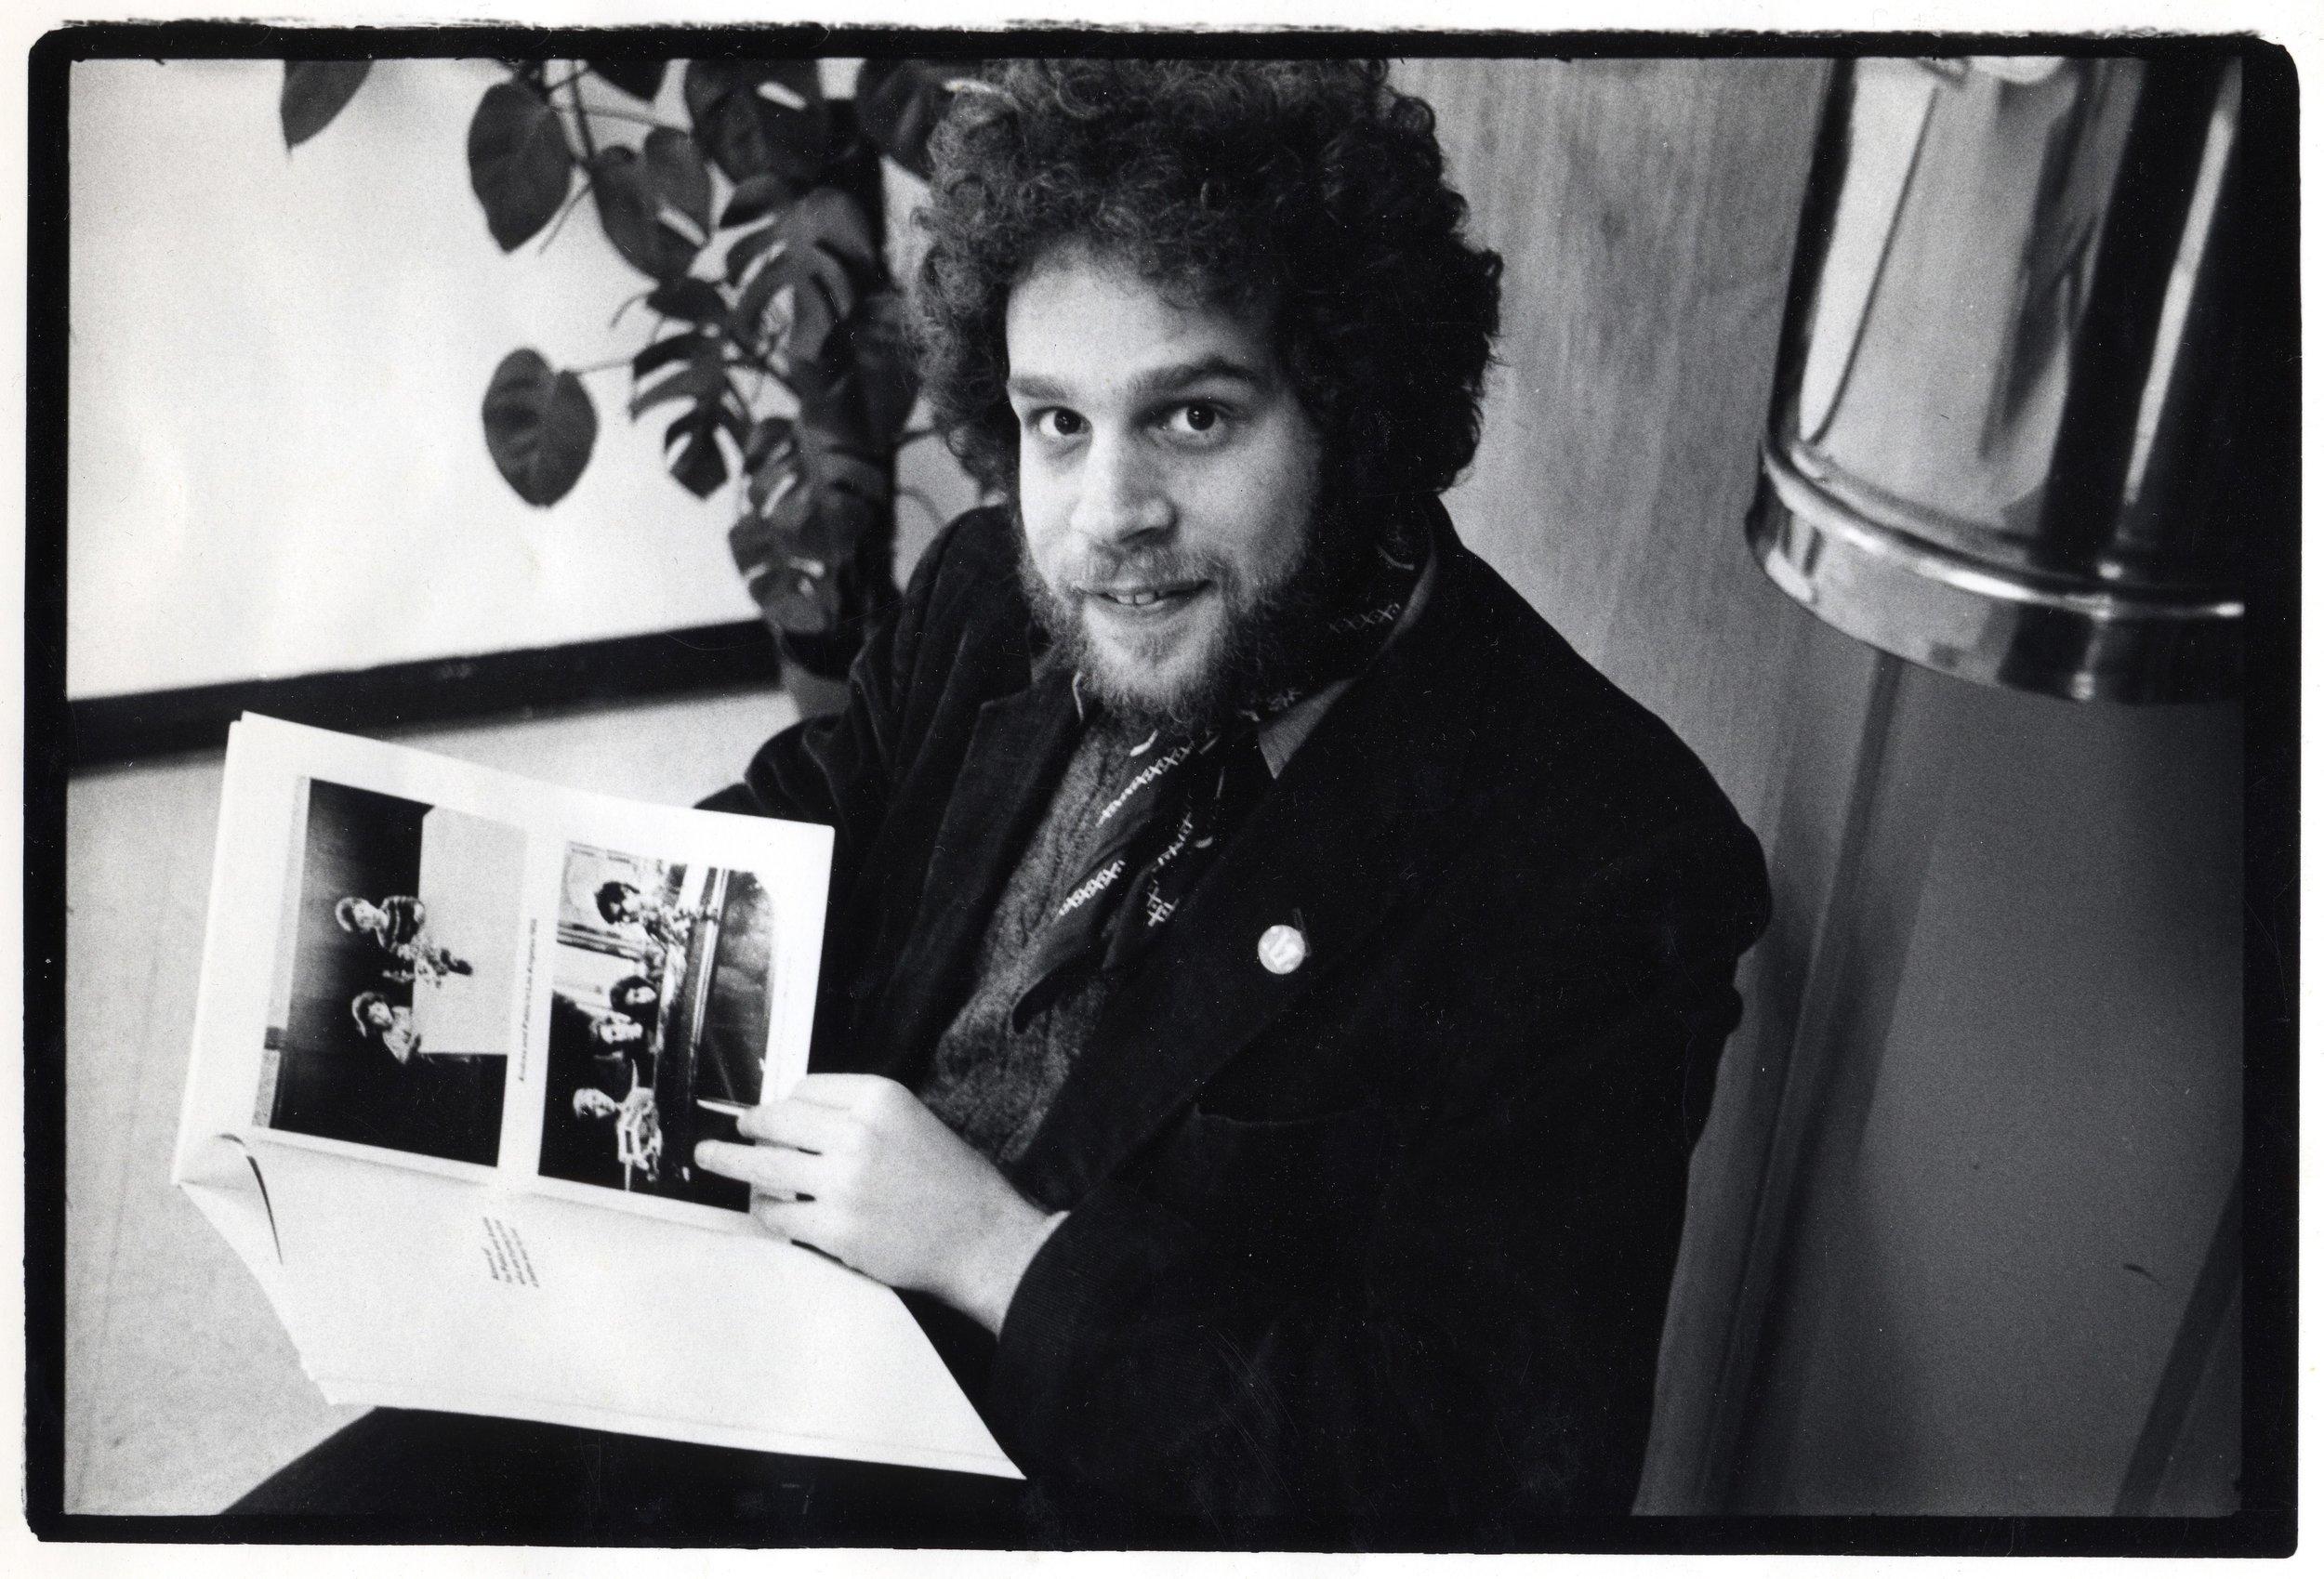 David Godlis, Imageworks 1974